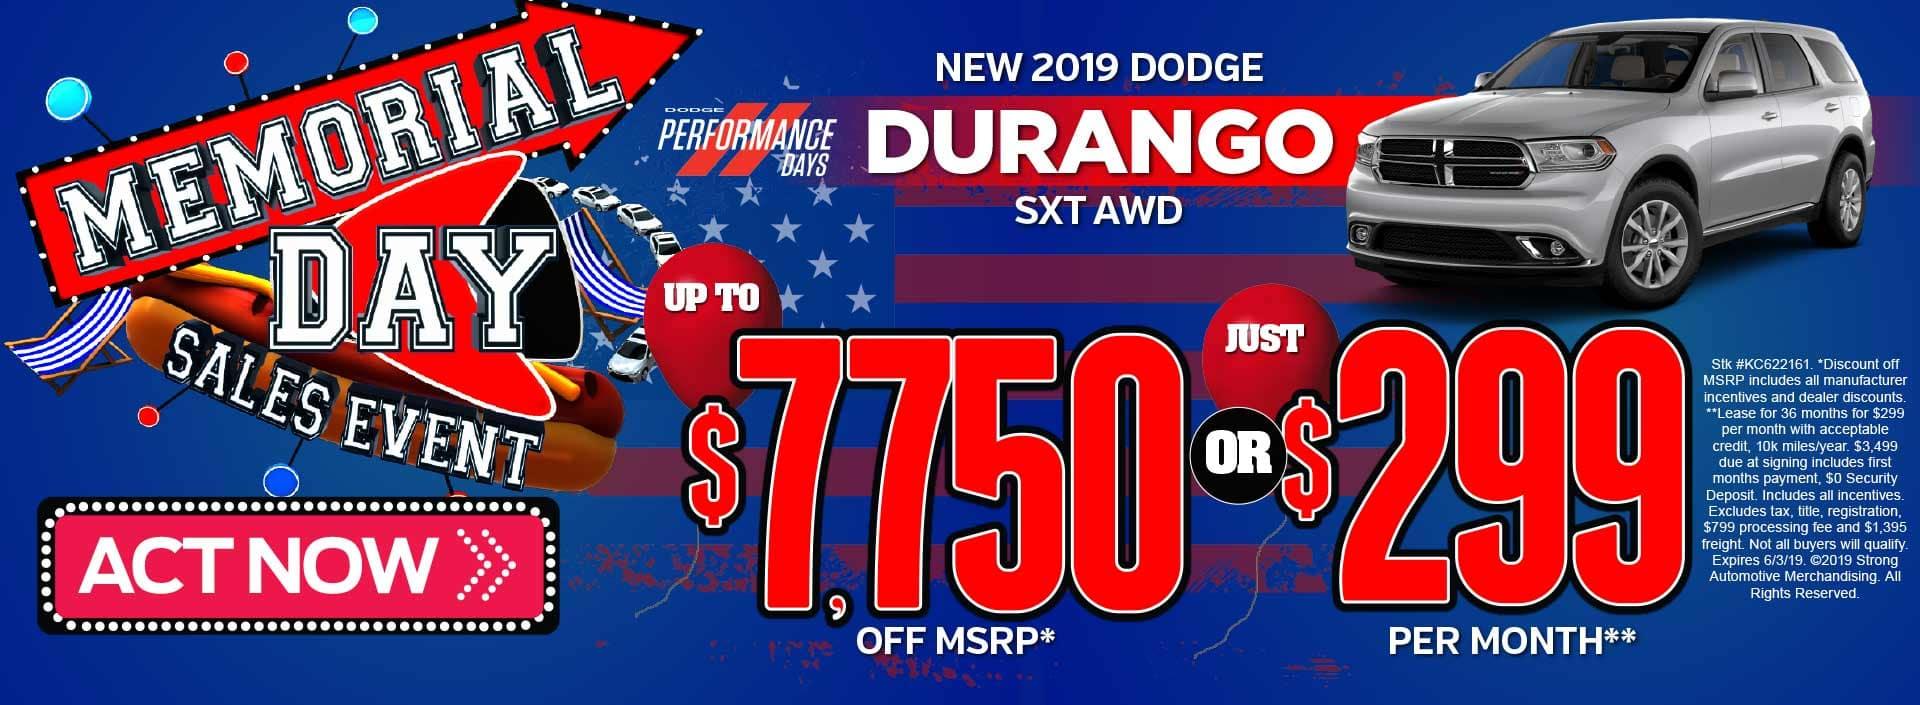 Durango Offer